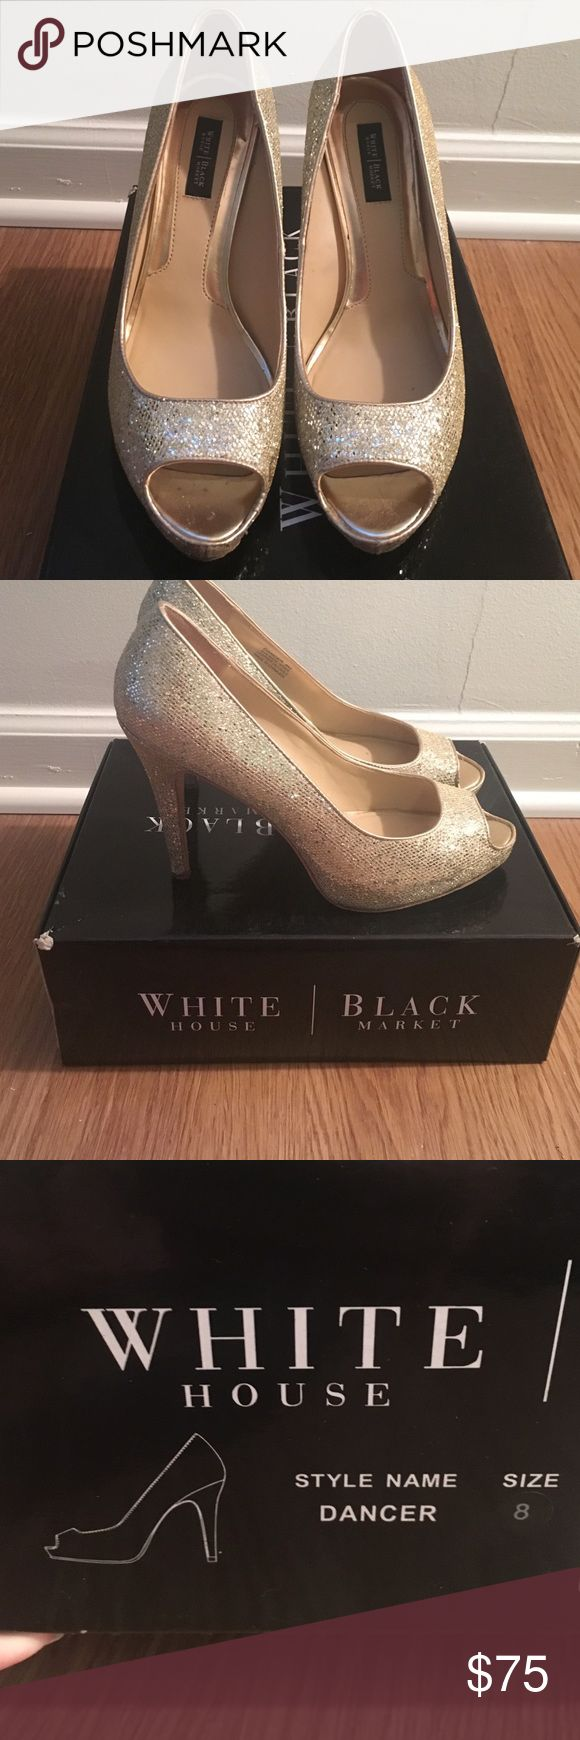 White House Black Market Gold Peep Toe Heels Gold sparkle peep toe heel. Dancer style size 8. White House Black Market Shoes Heels